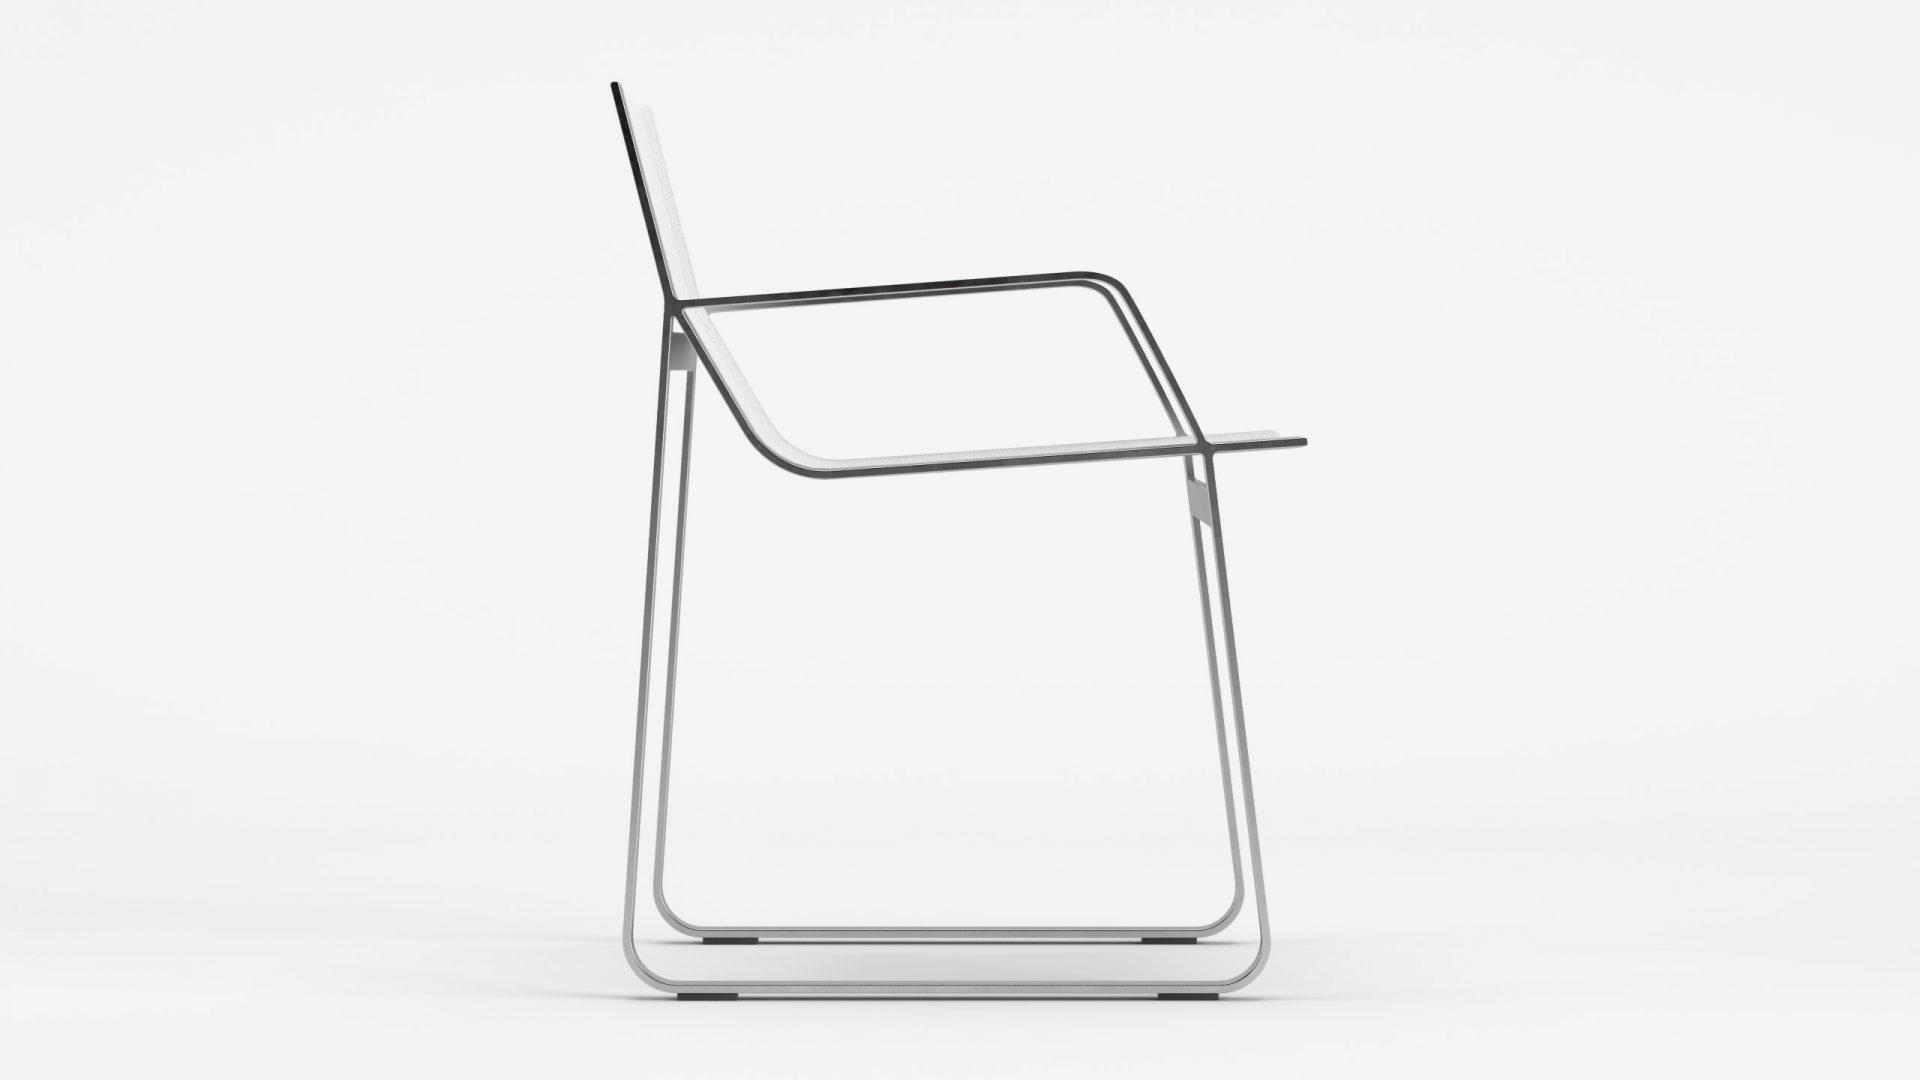 008_Essentiel_Chair_0711E2_WhiteSet_01_0001